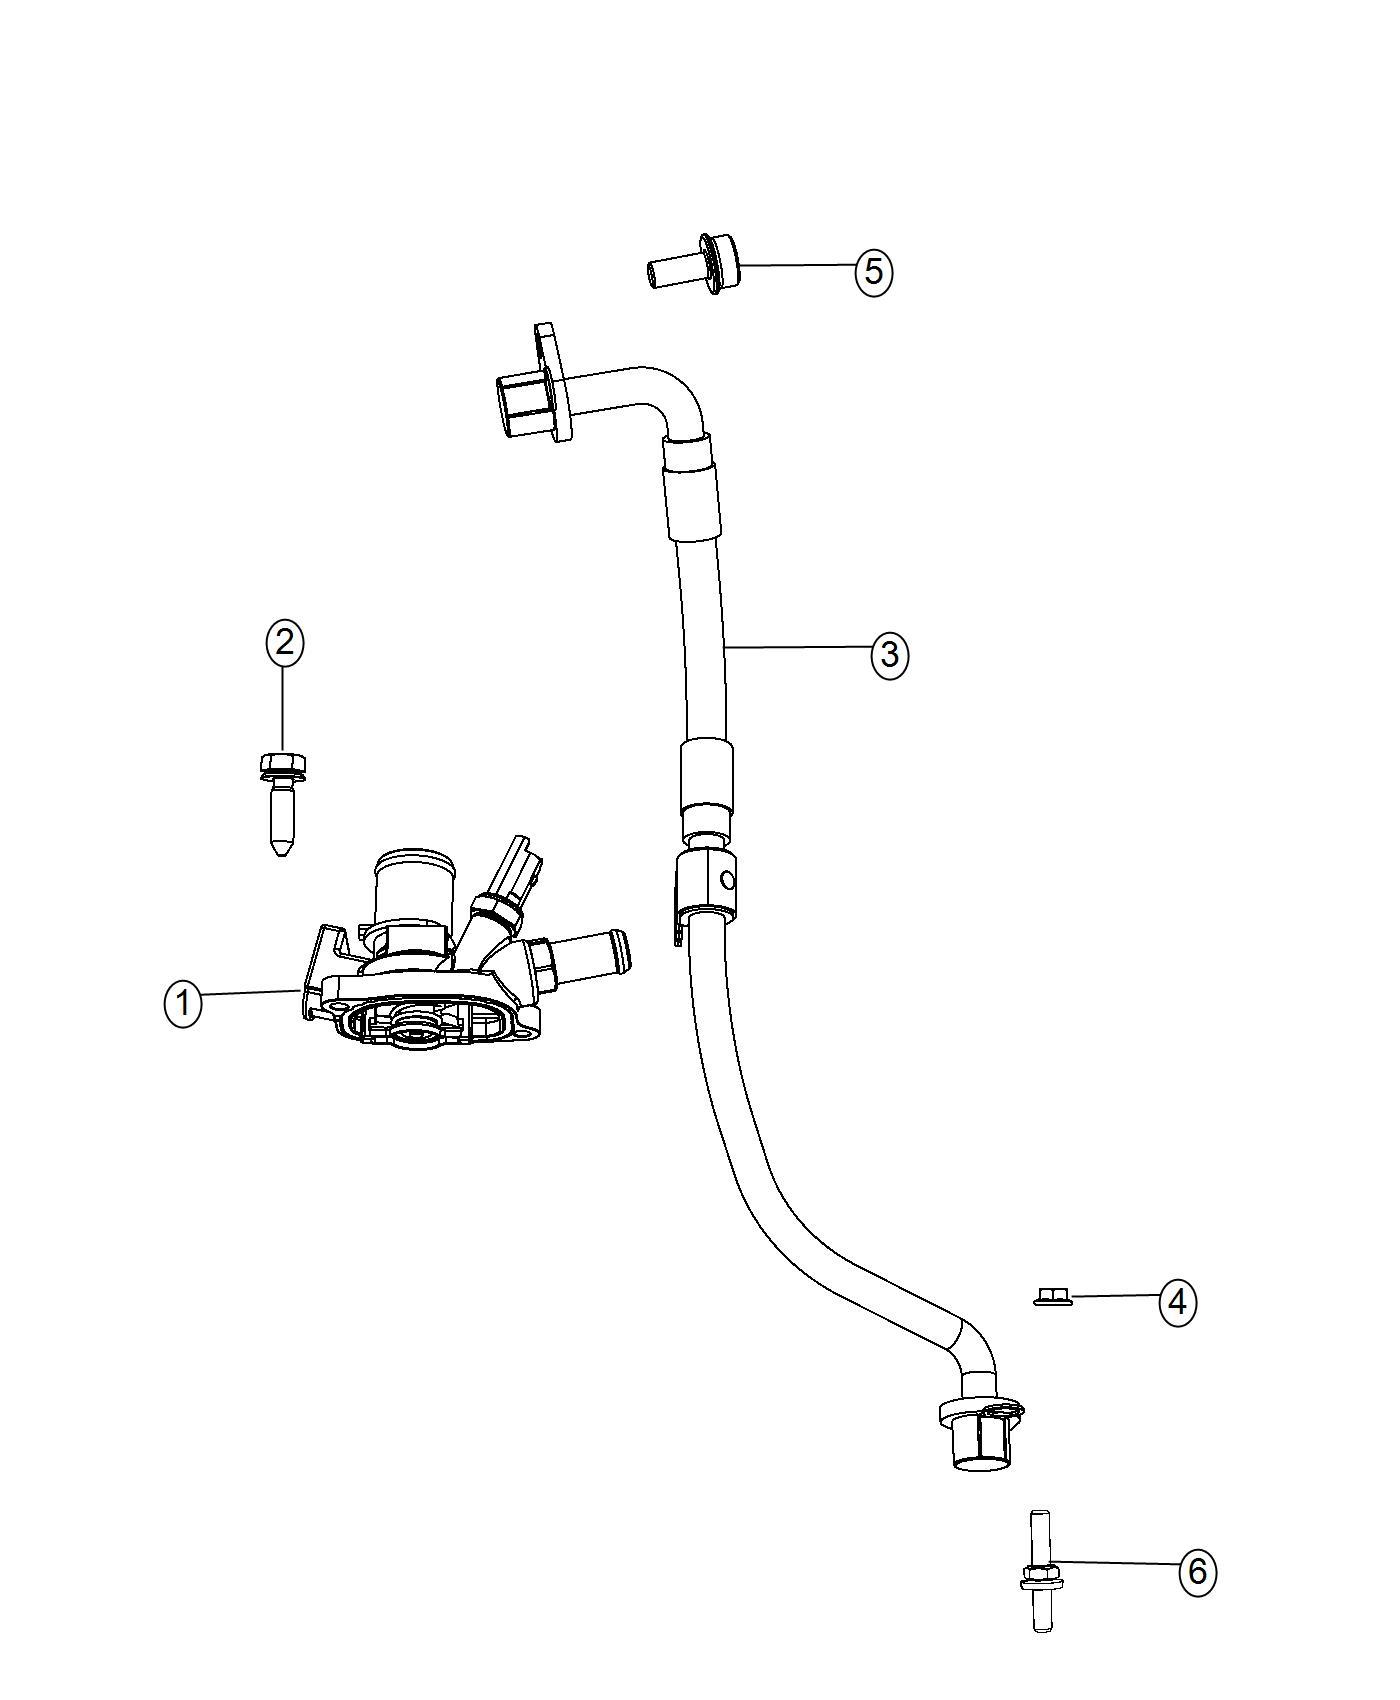 2017 Fiat 500 ABARTH HATCHBACK 1.4L Turbo I4 M/T O ring